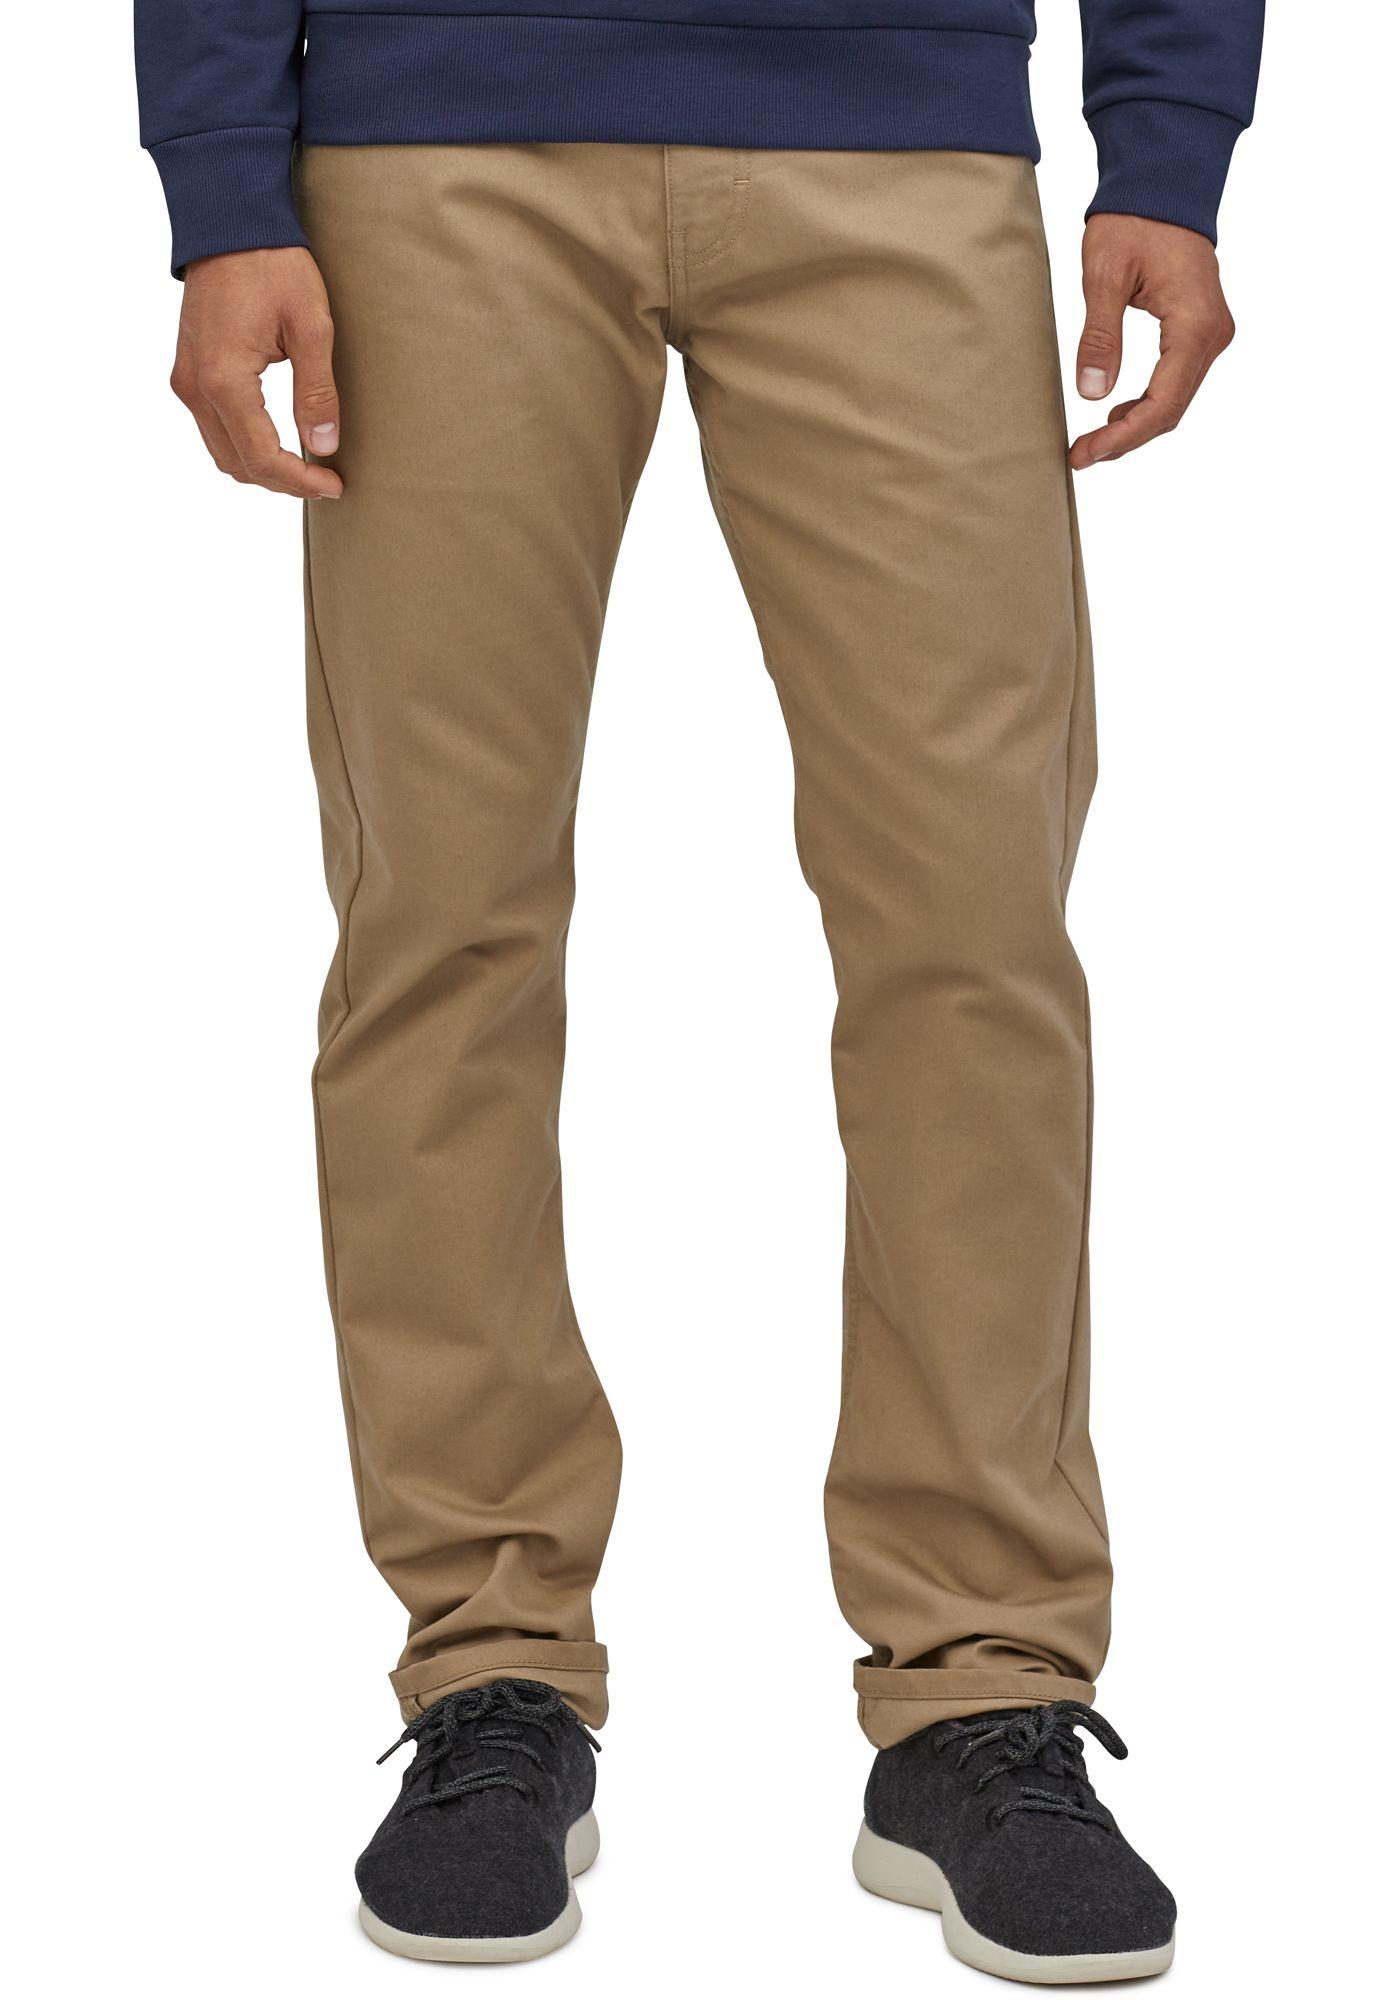 Patagonia Men's Performance Twill Pants